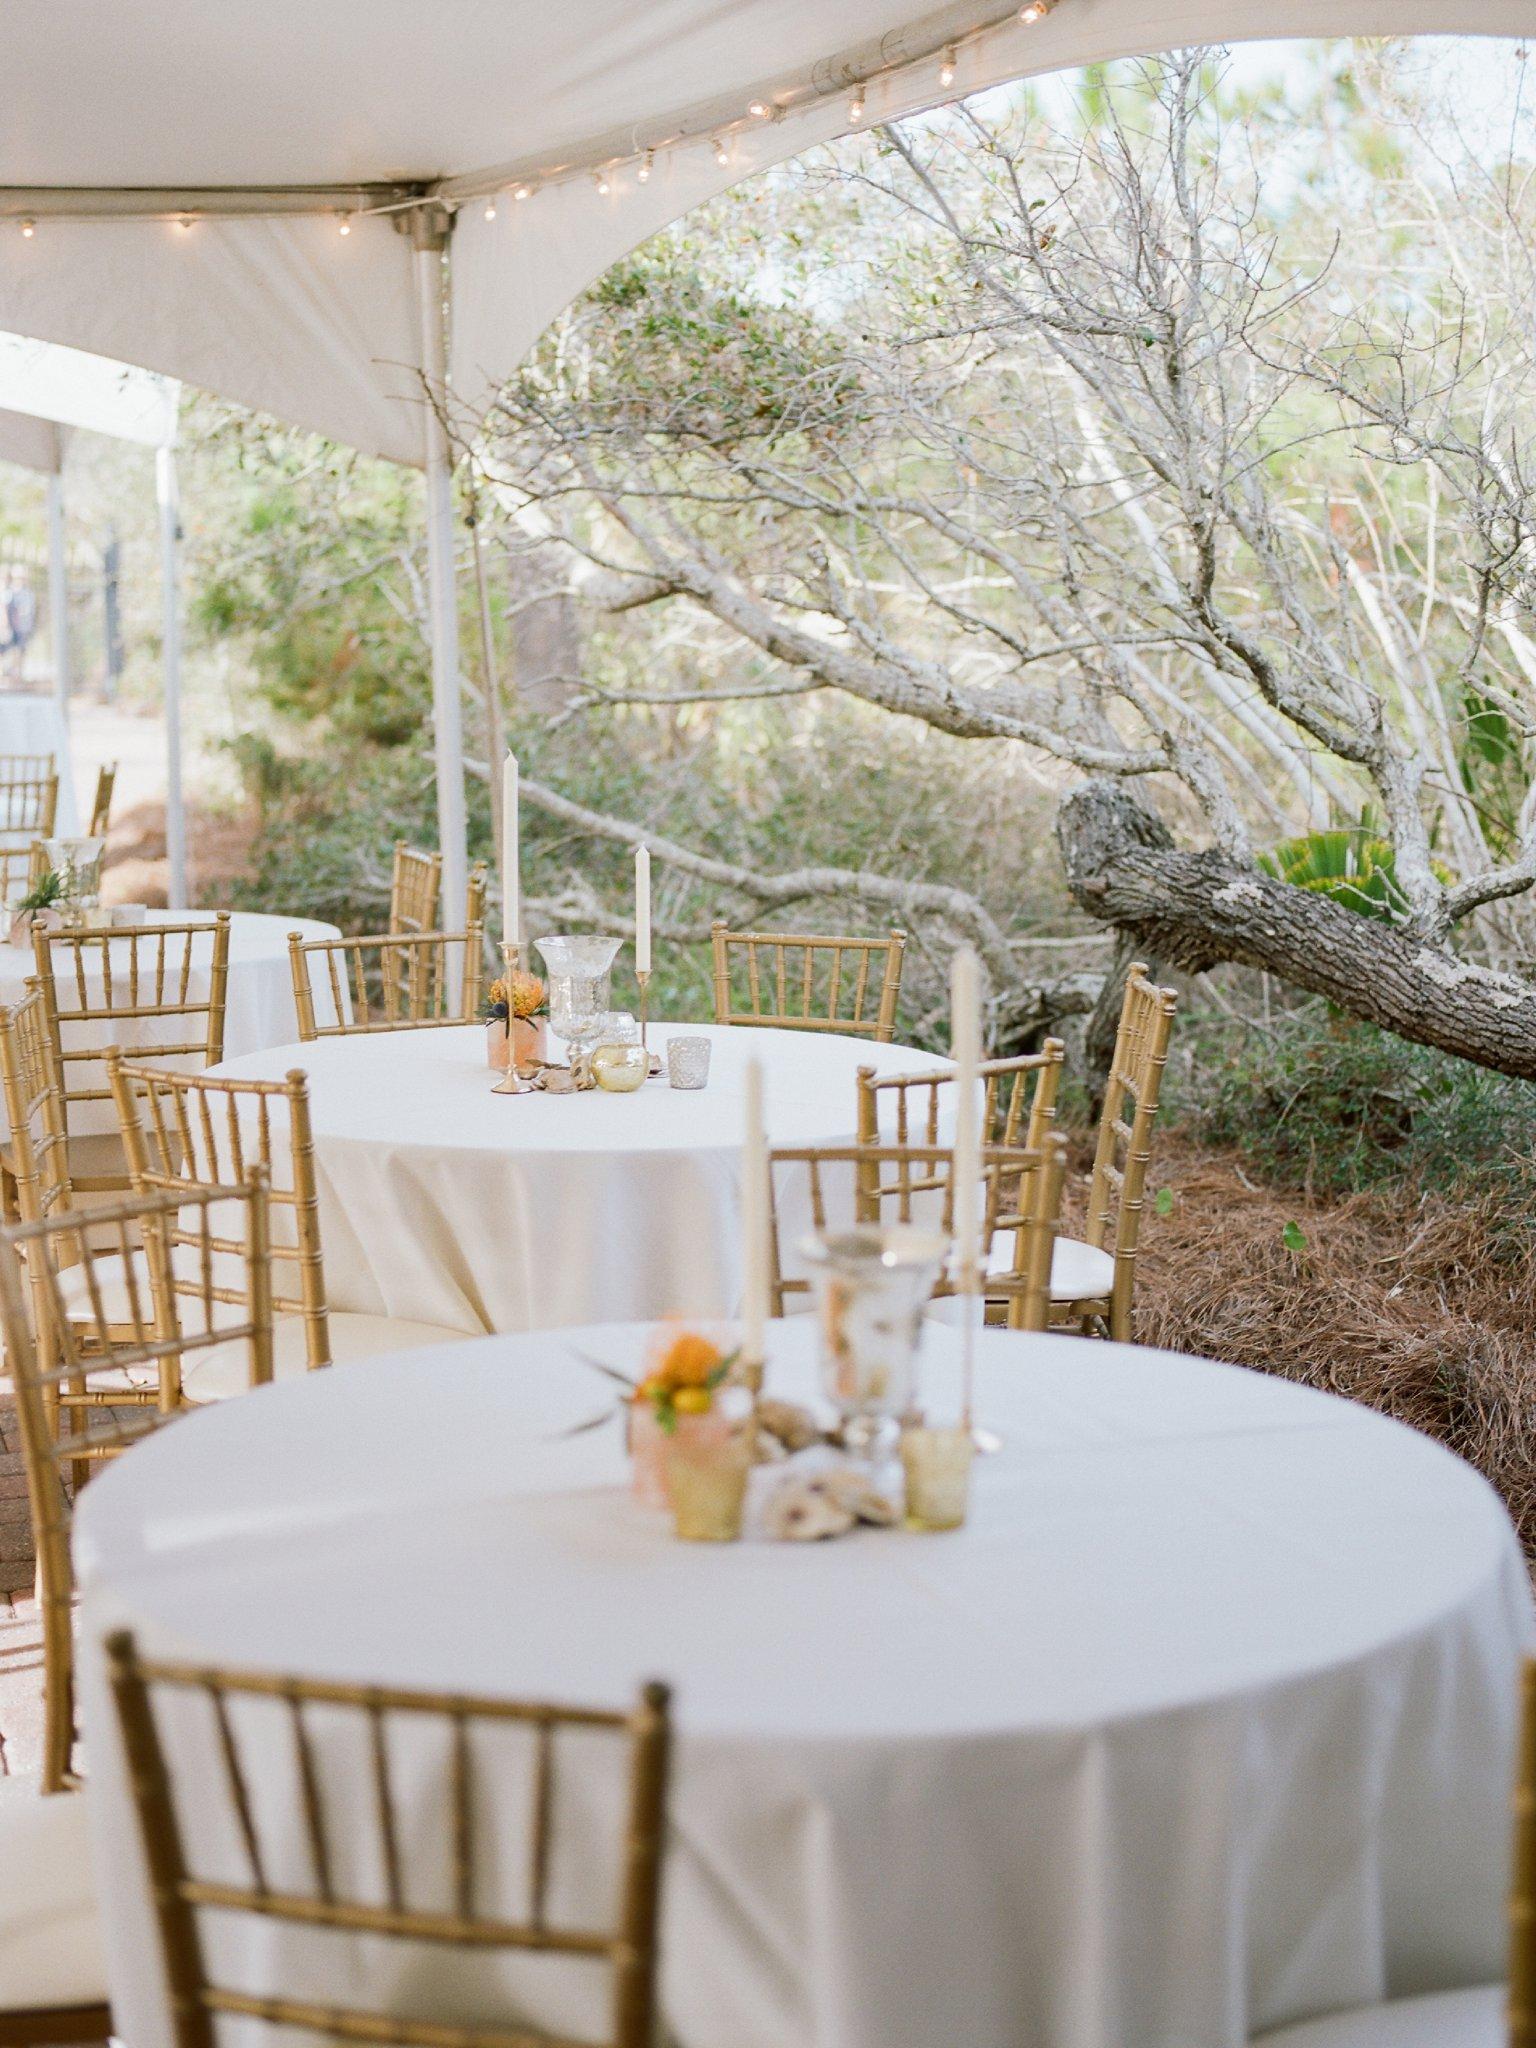 st+george+island+wedding+st+george+island+photographer+shannon+griffin+photography_0090.jpg